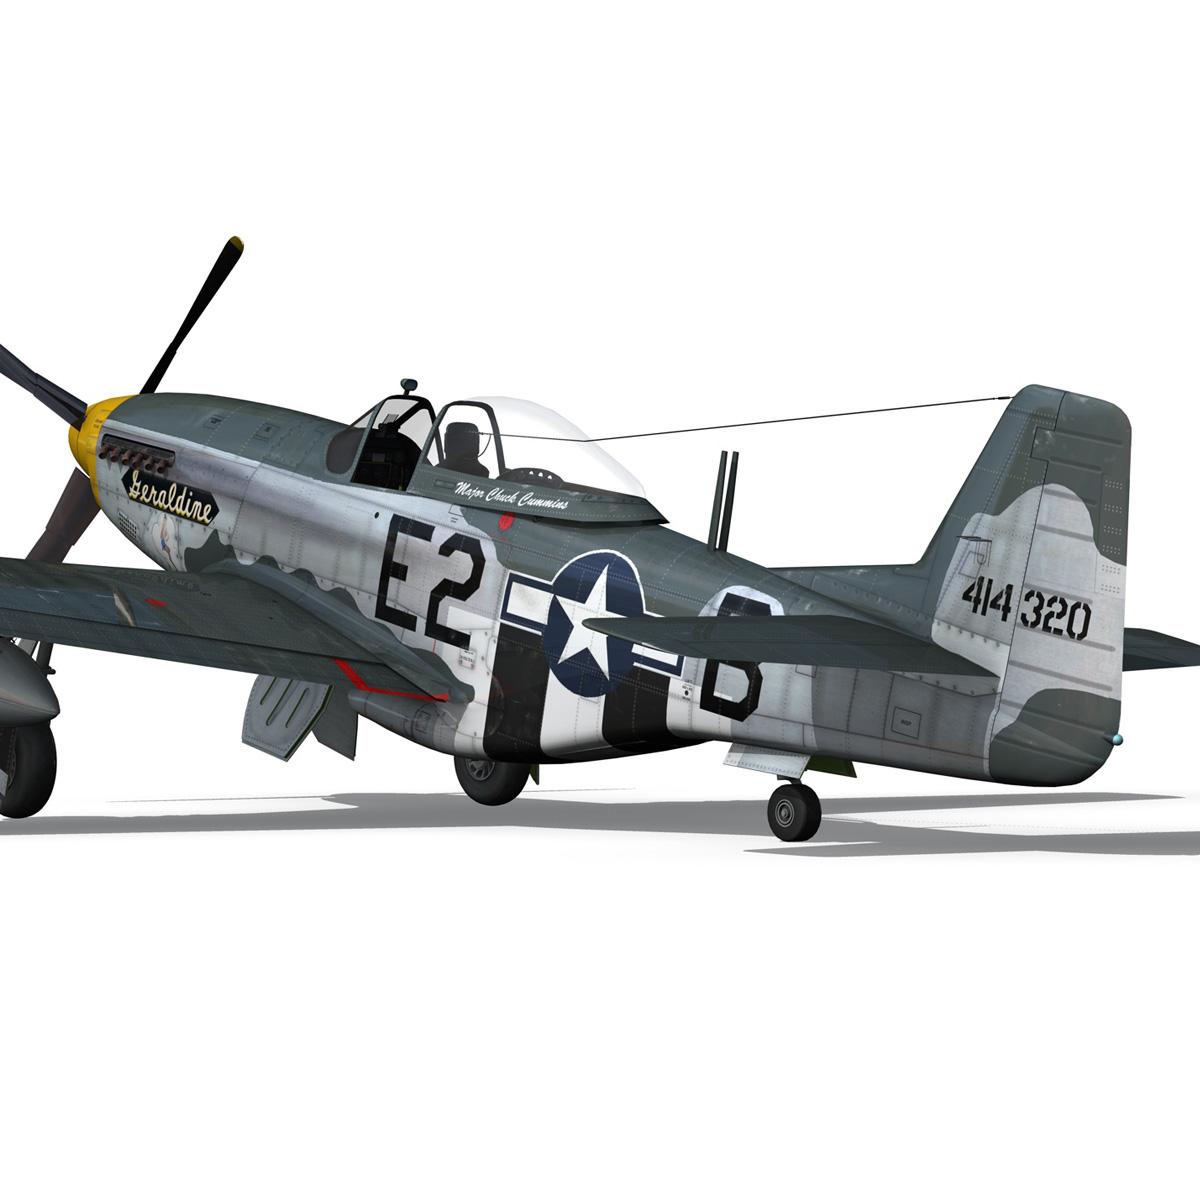 North American P-51D - Geraldine 3d model fbx c4d lwo obj 265948